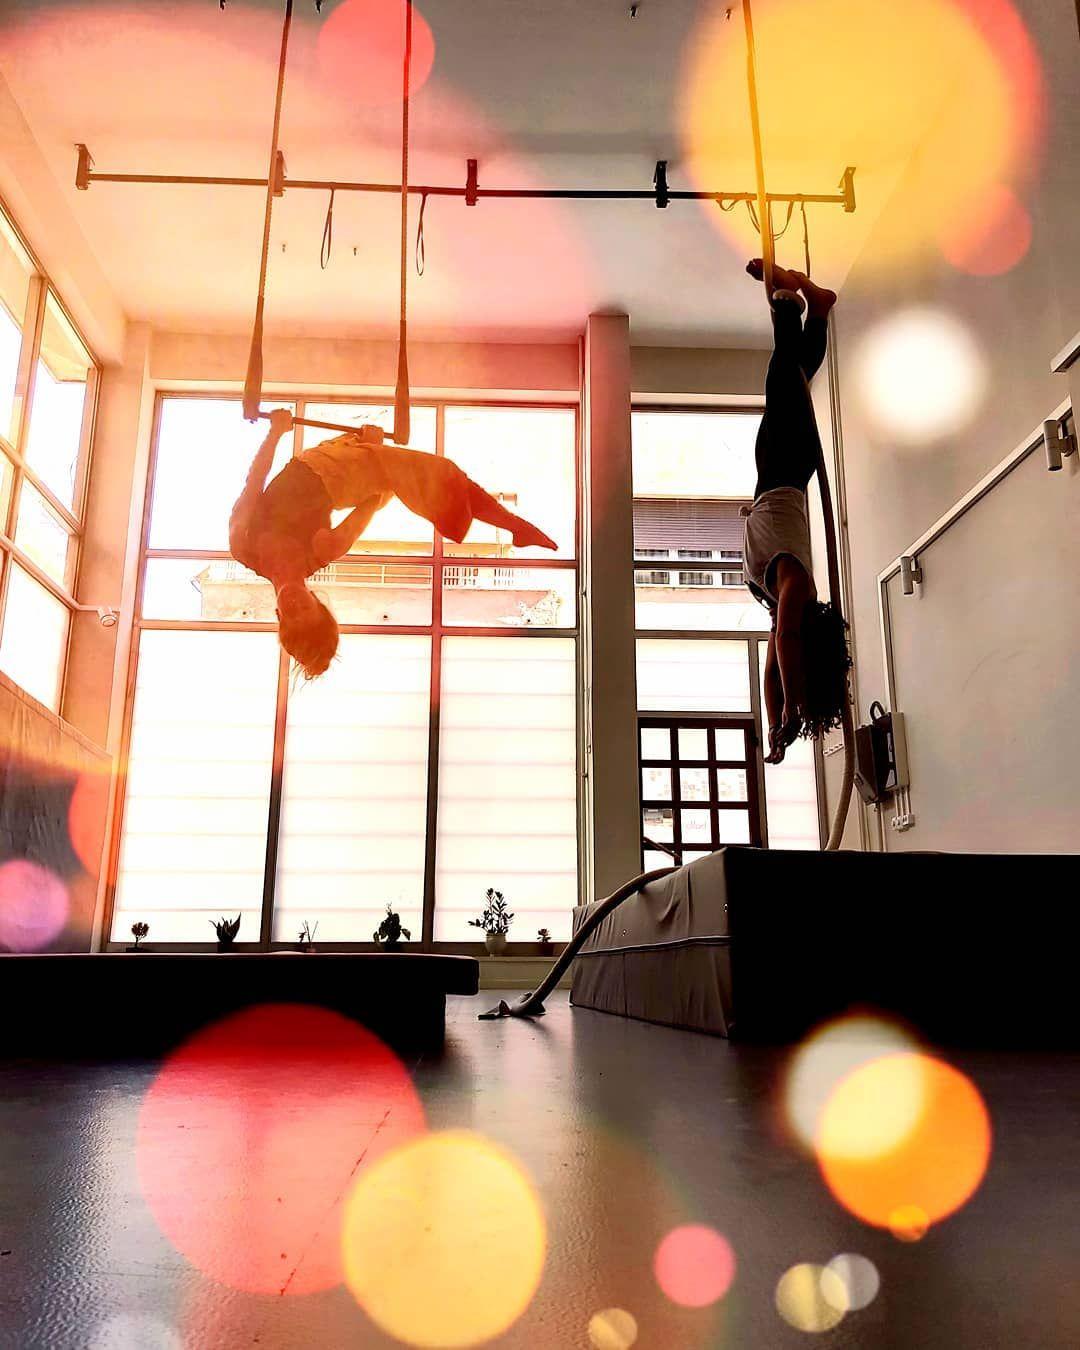 Preparations.... Are you ready?  #pilates #fitness #rocketyoga #yogainspiration #yogaathens #yogalif...